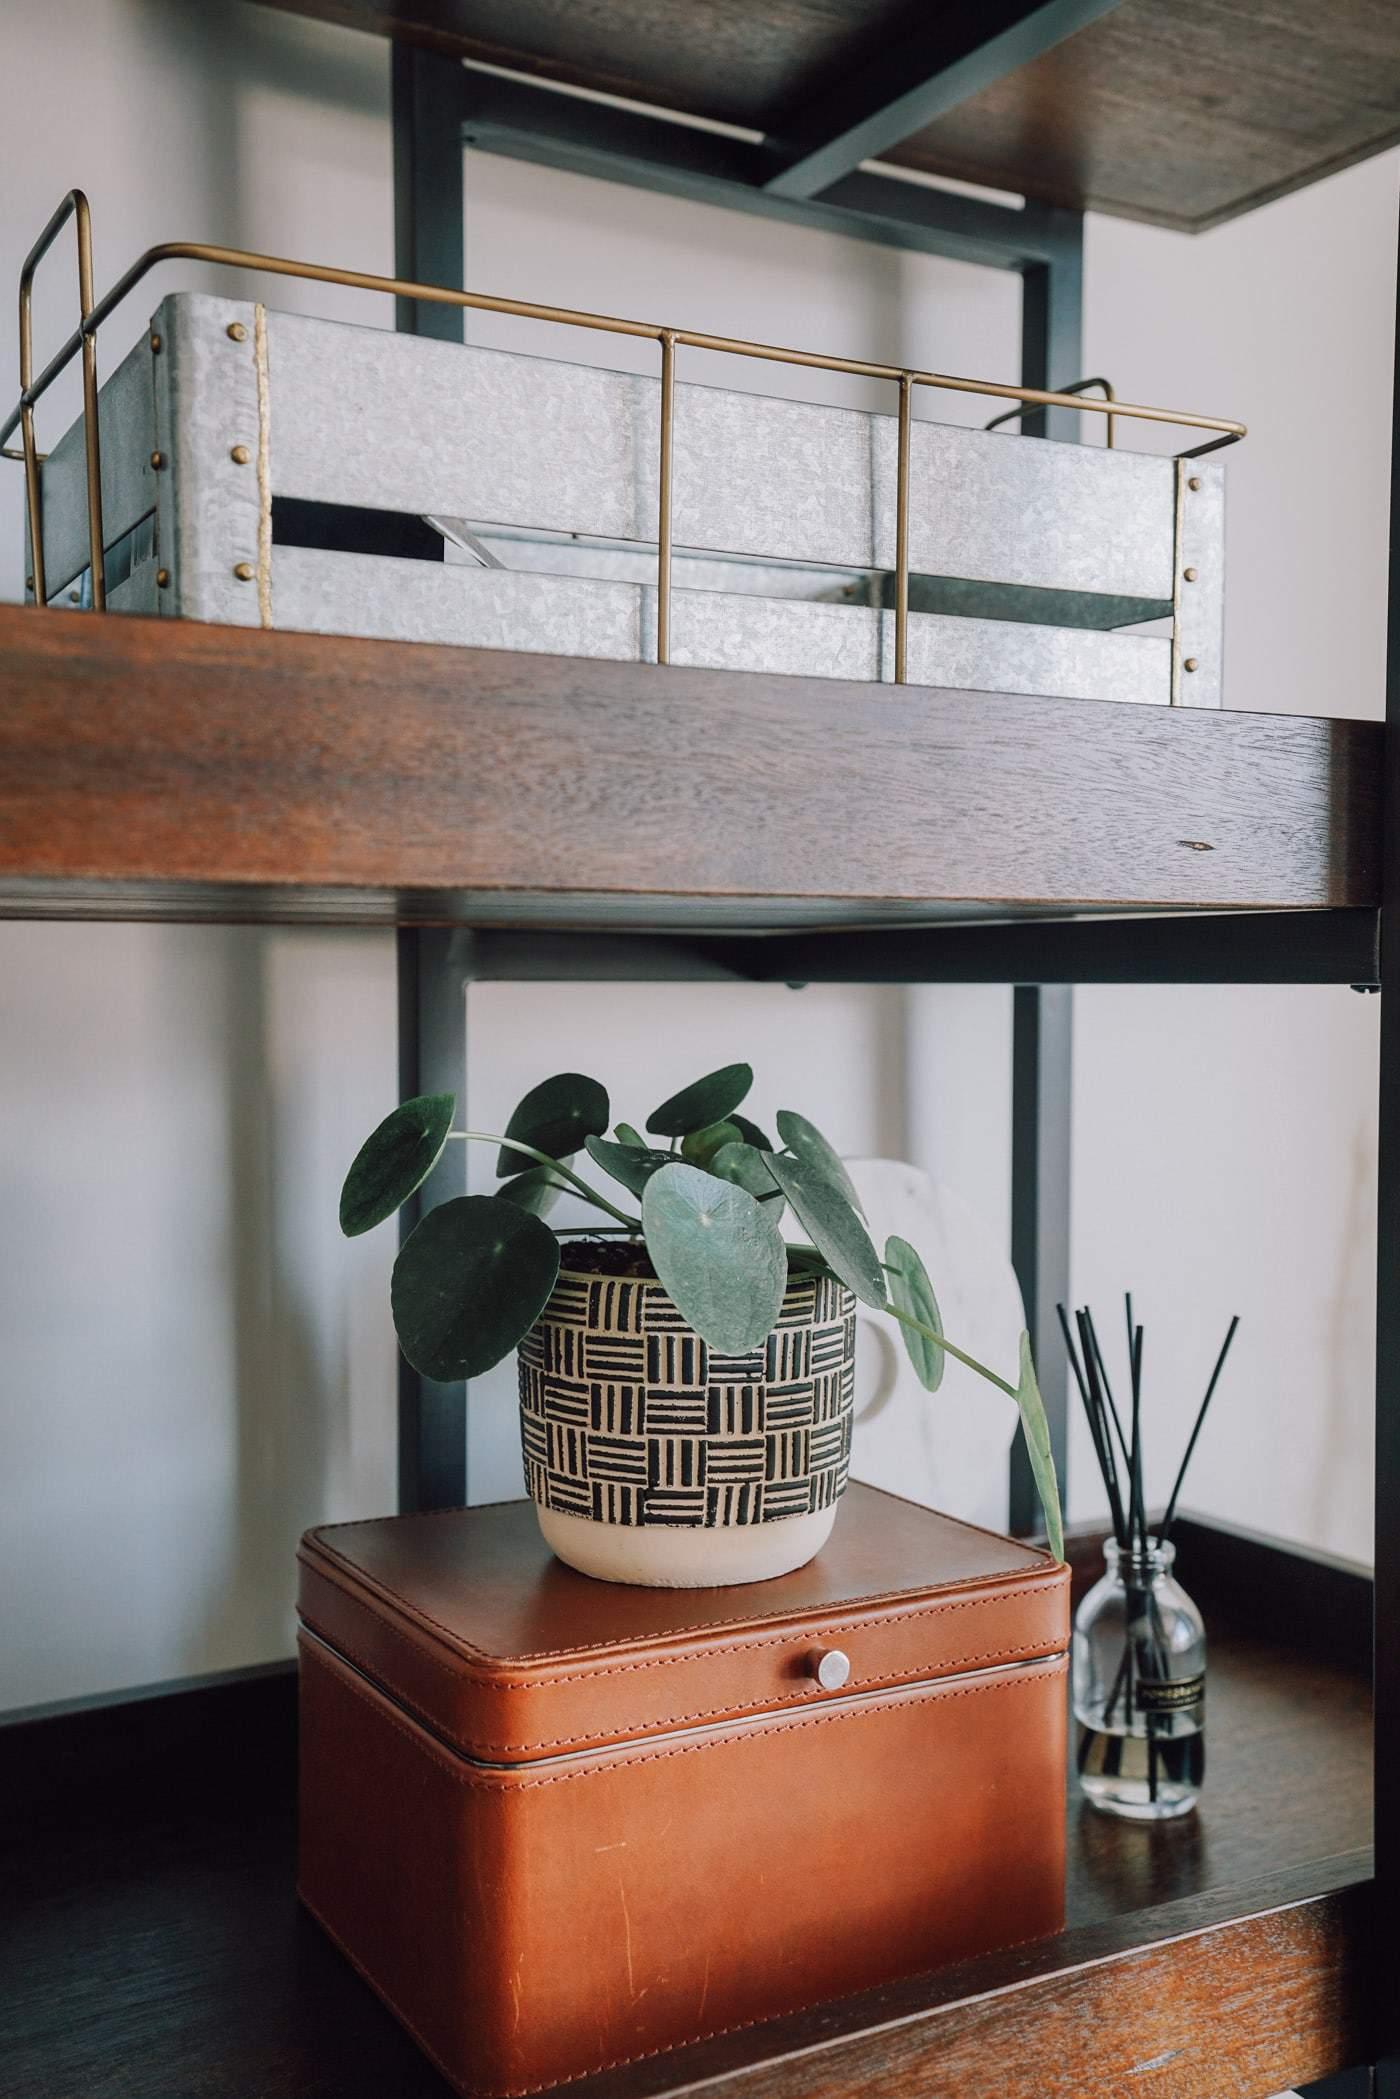 Places to Buy Indoor Plants Online, indoor plants, indoor planters, A Lily Love Affair